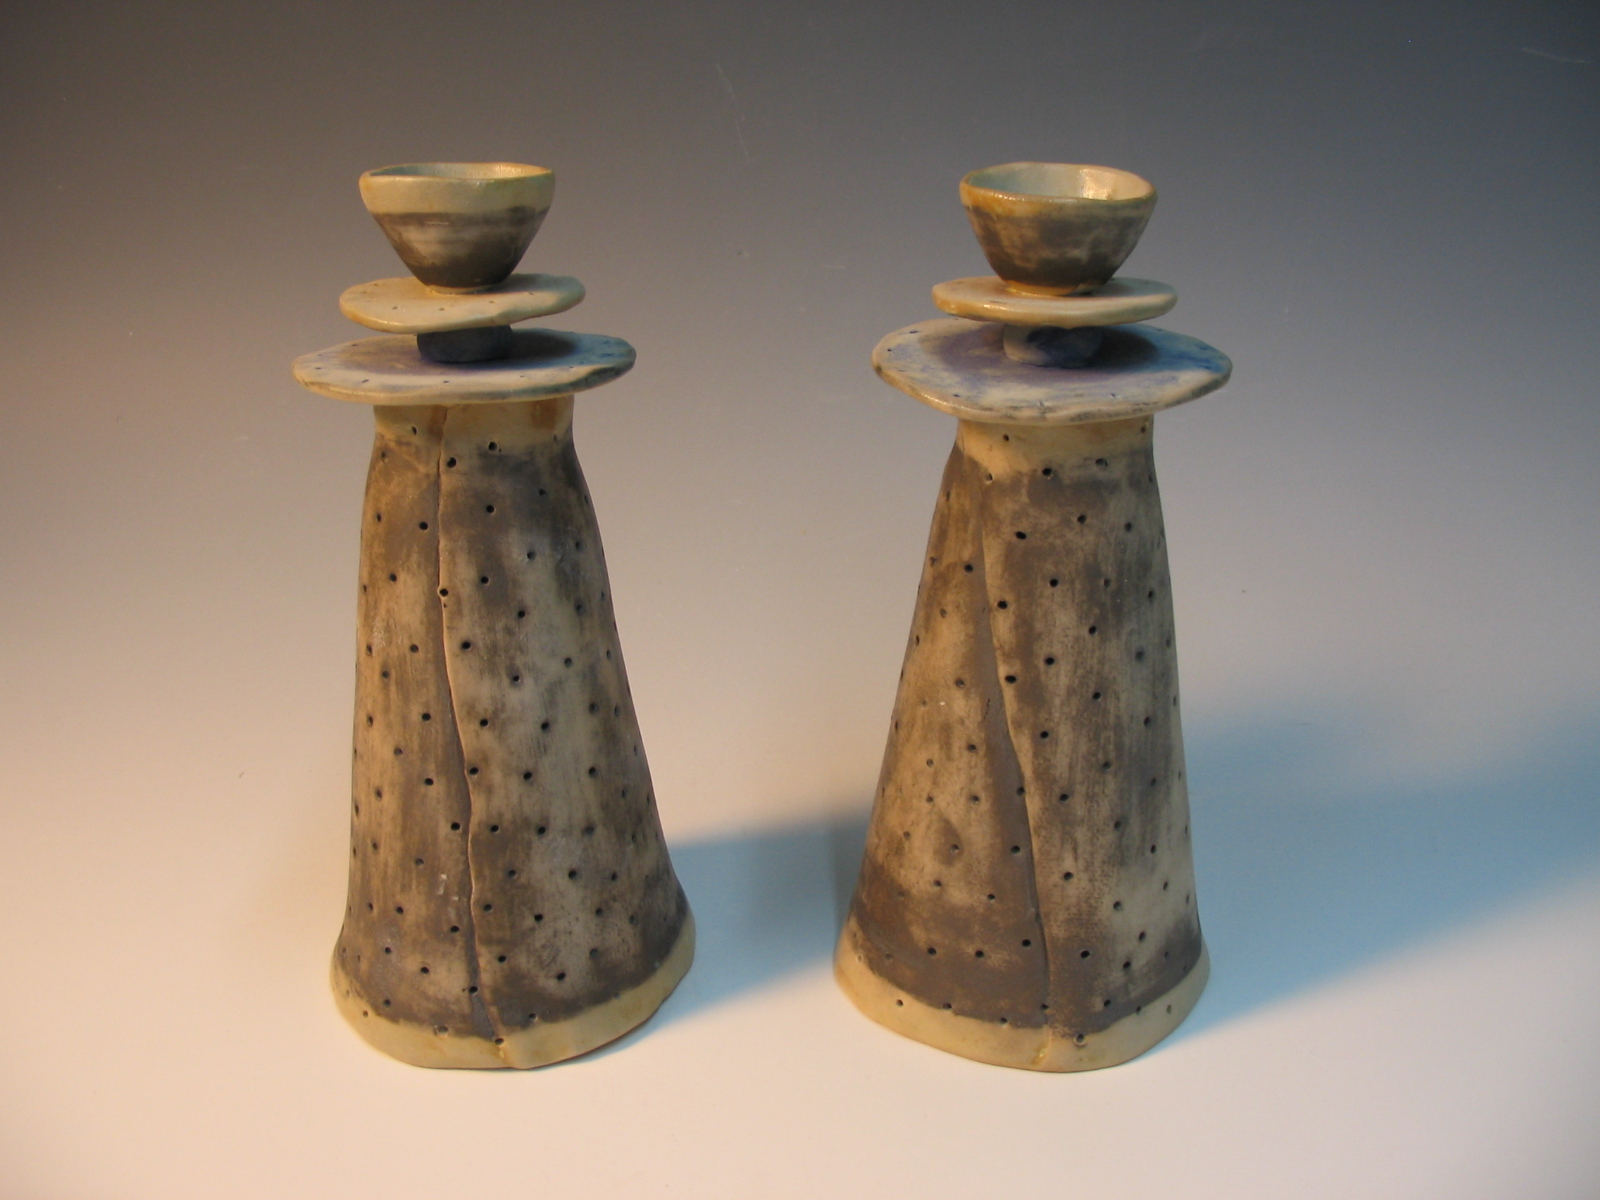 Candle sticks - porcelain